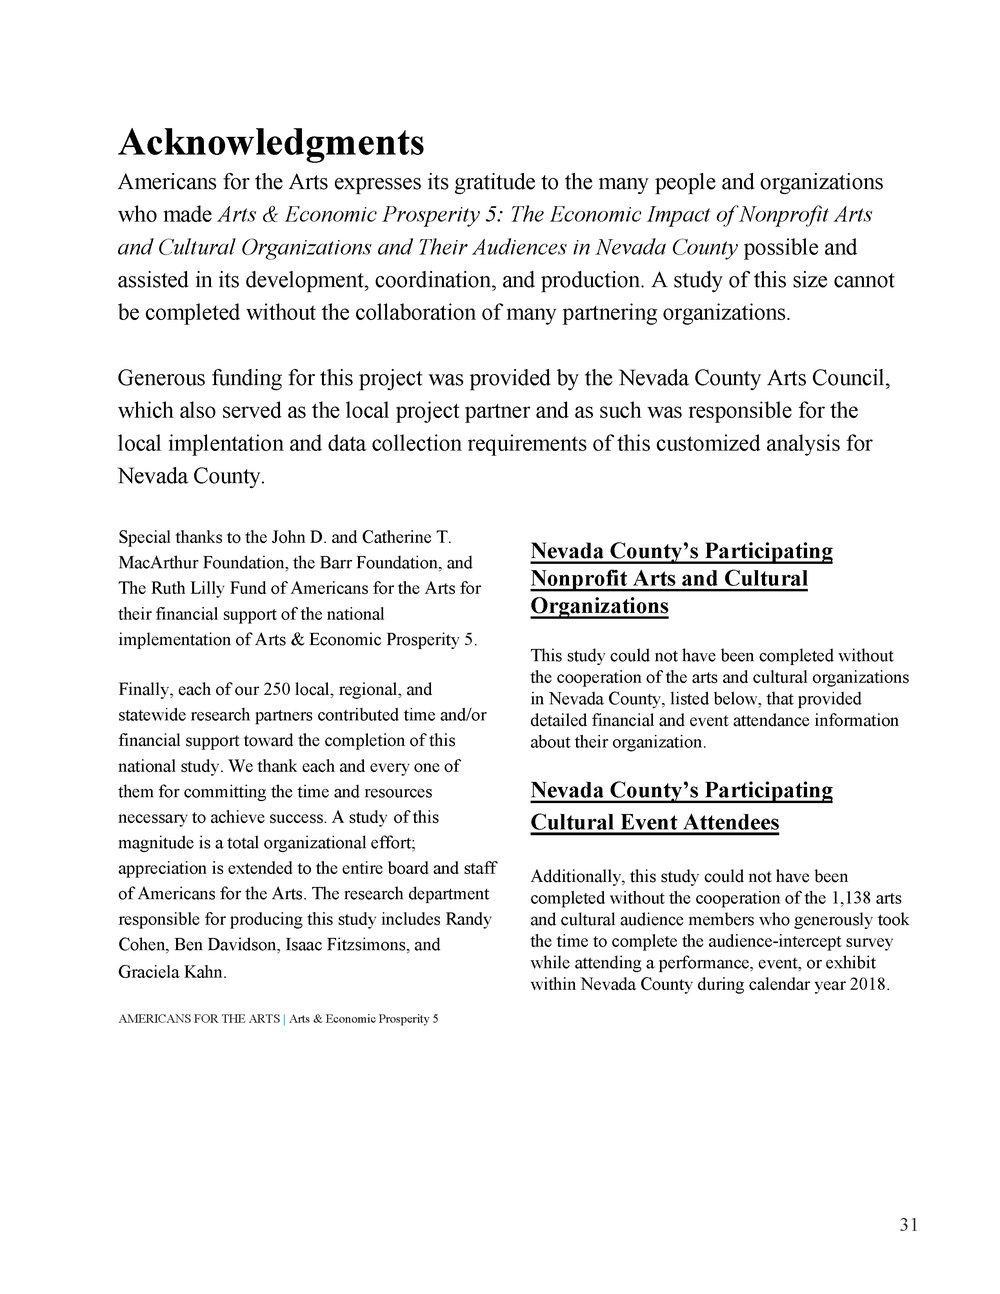 Arts & Economic Prosperity in Nevada County_Page_35.jpg